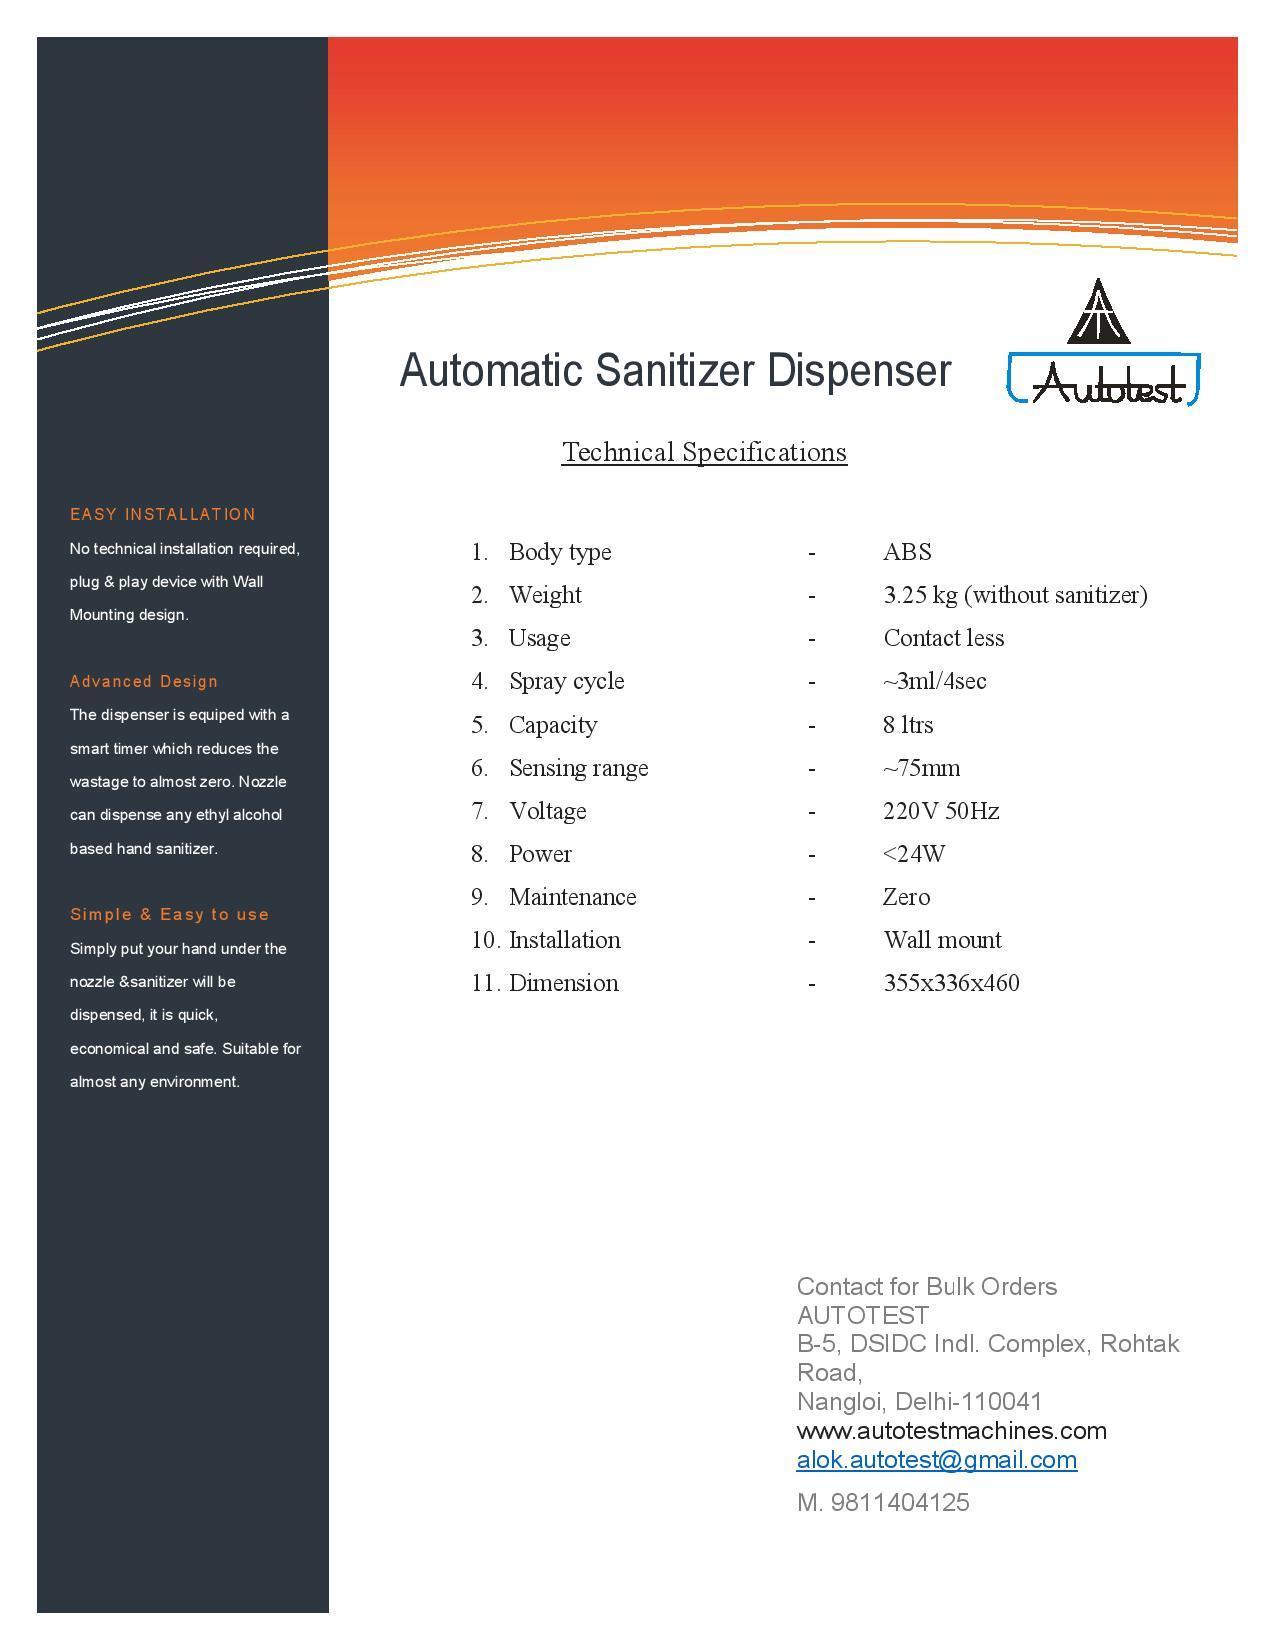 Automatic Hand Sanitizer